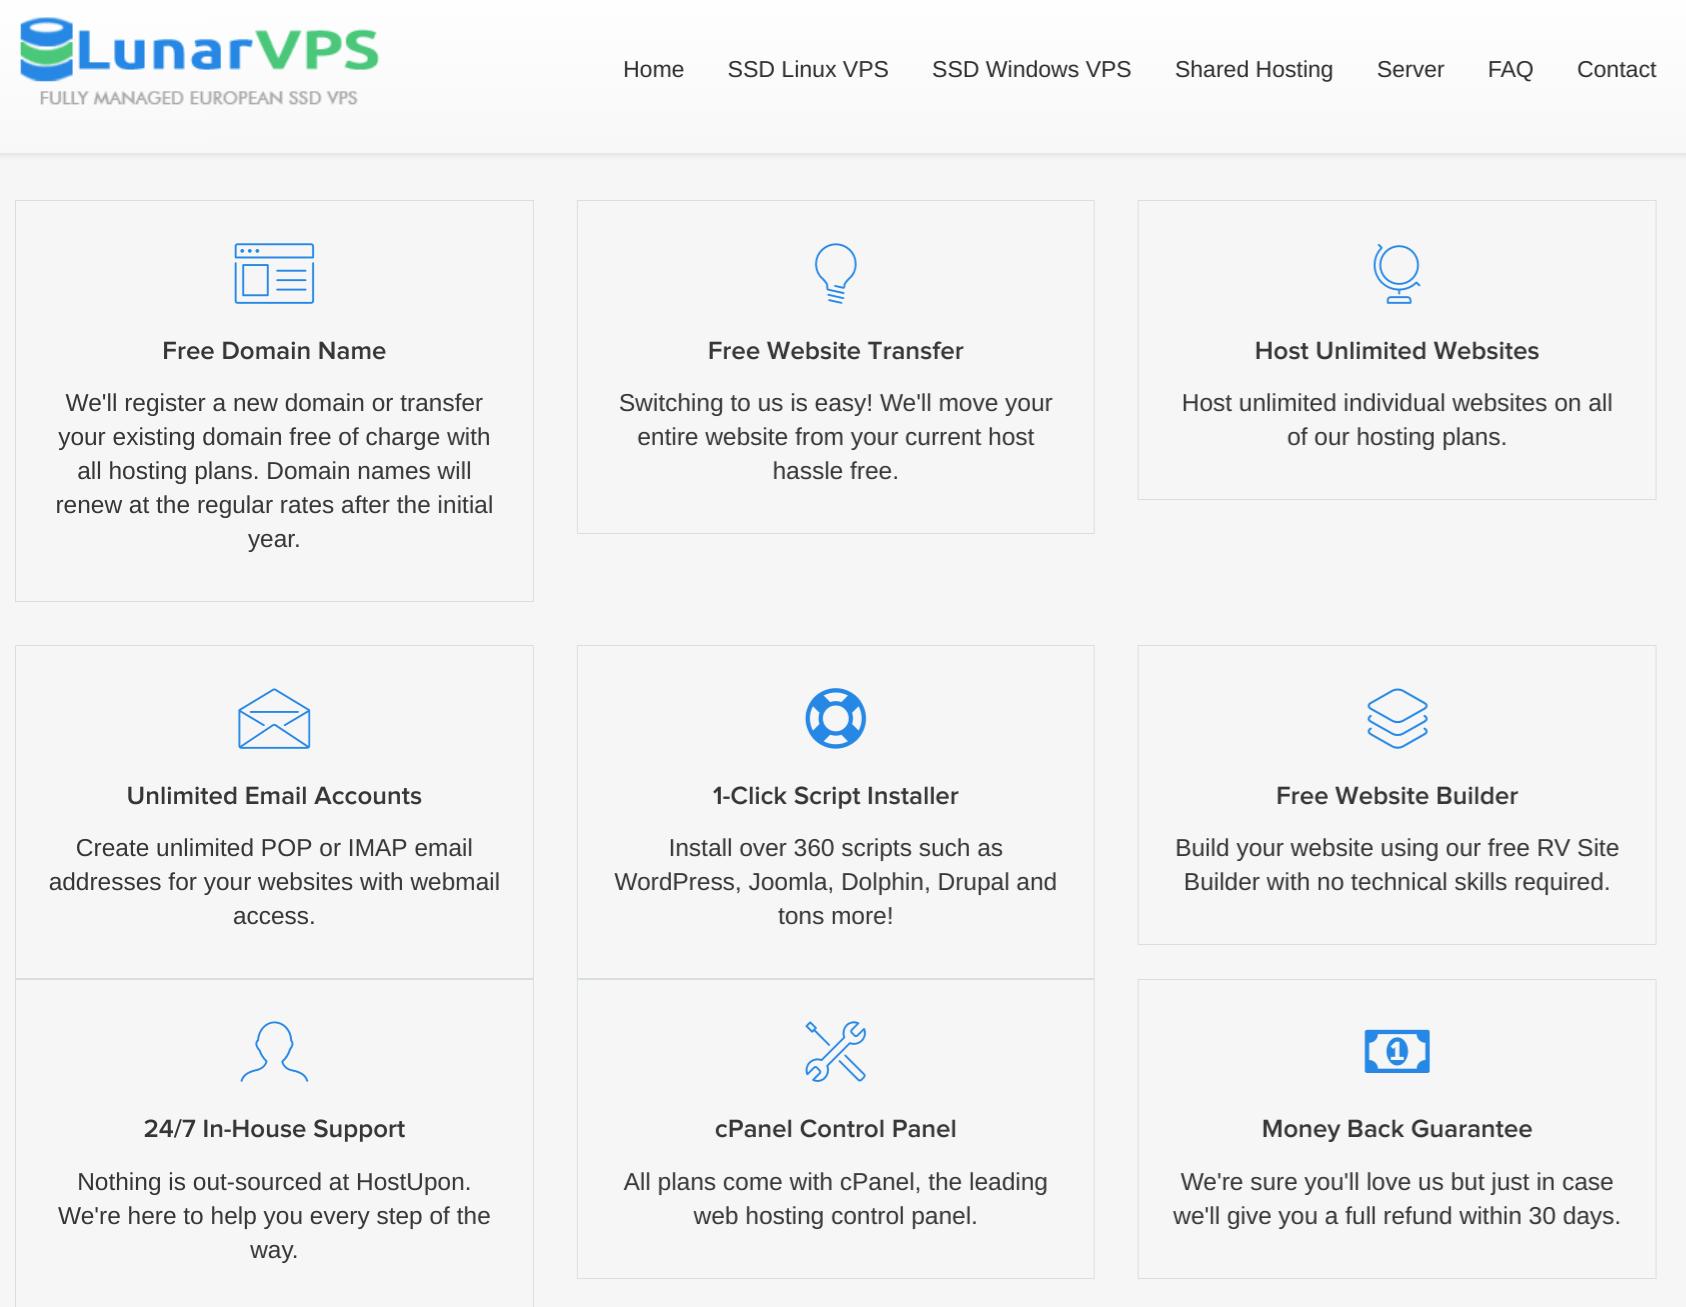 LunarVPS-overview1